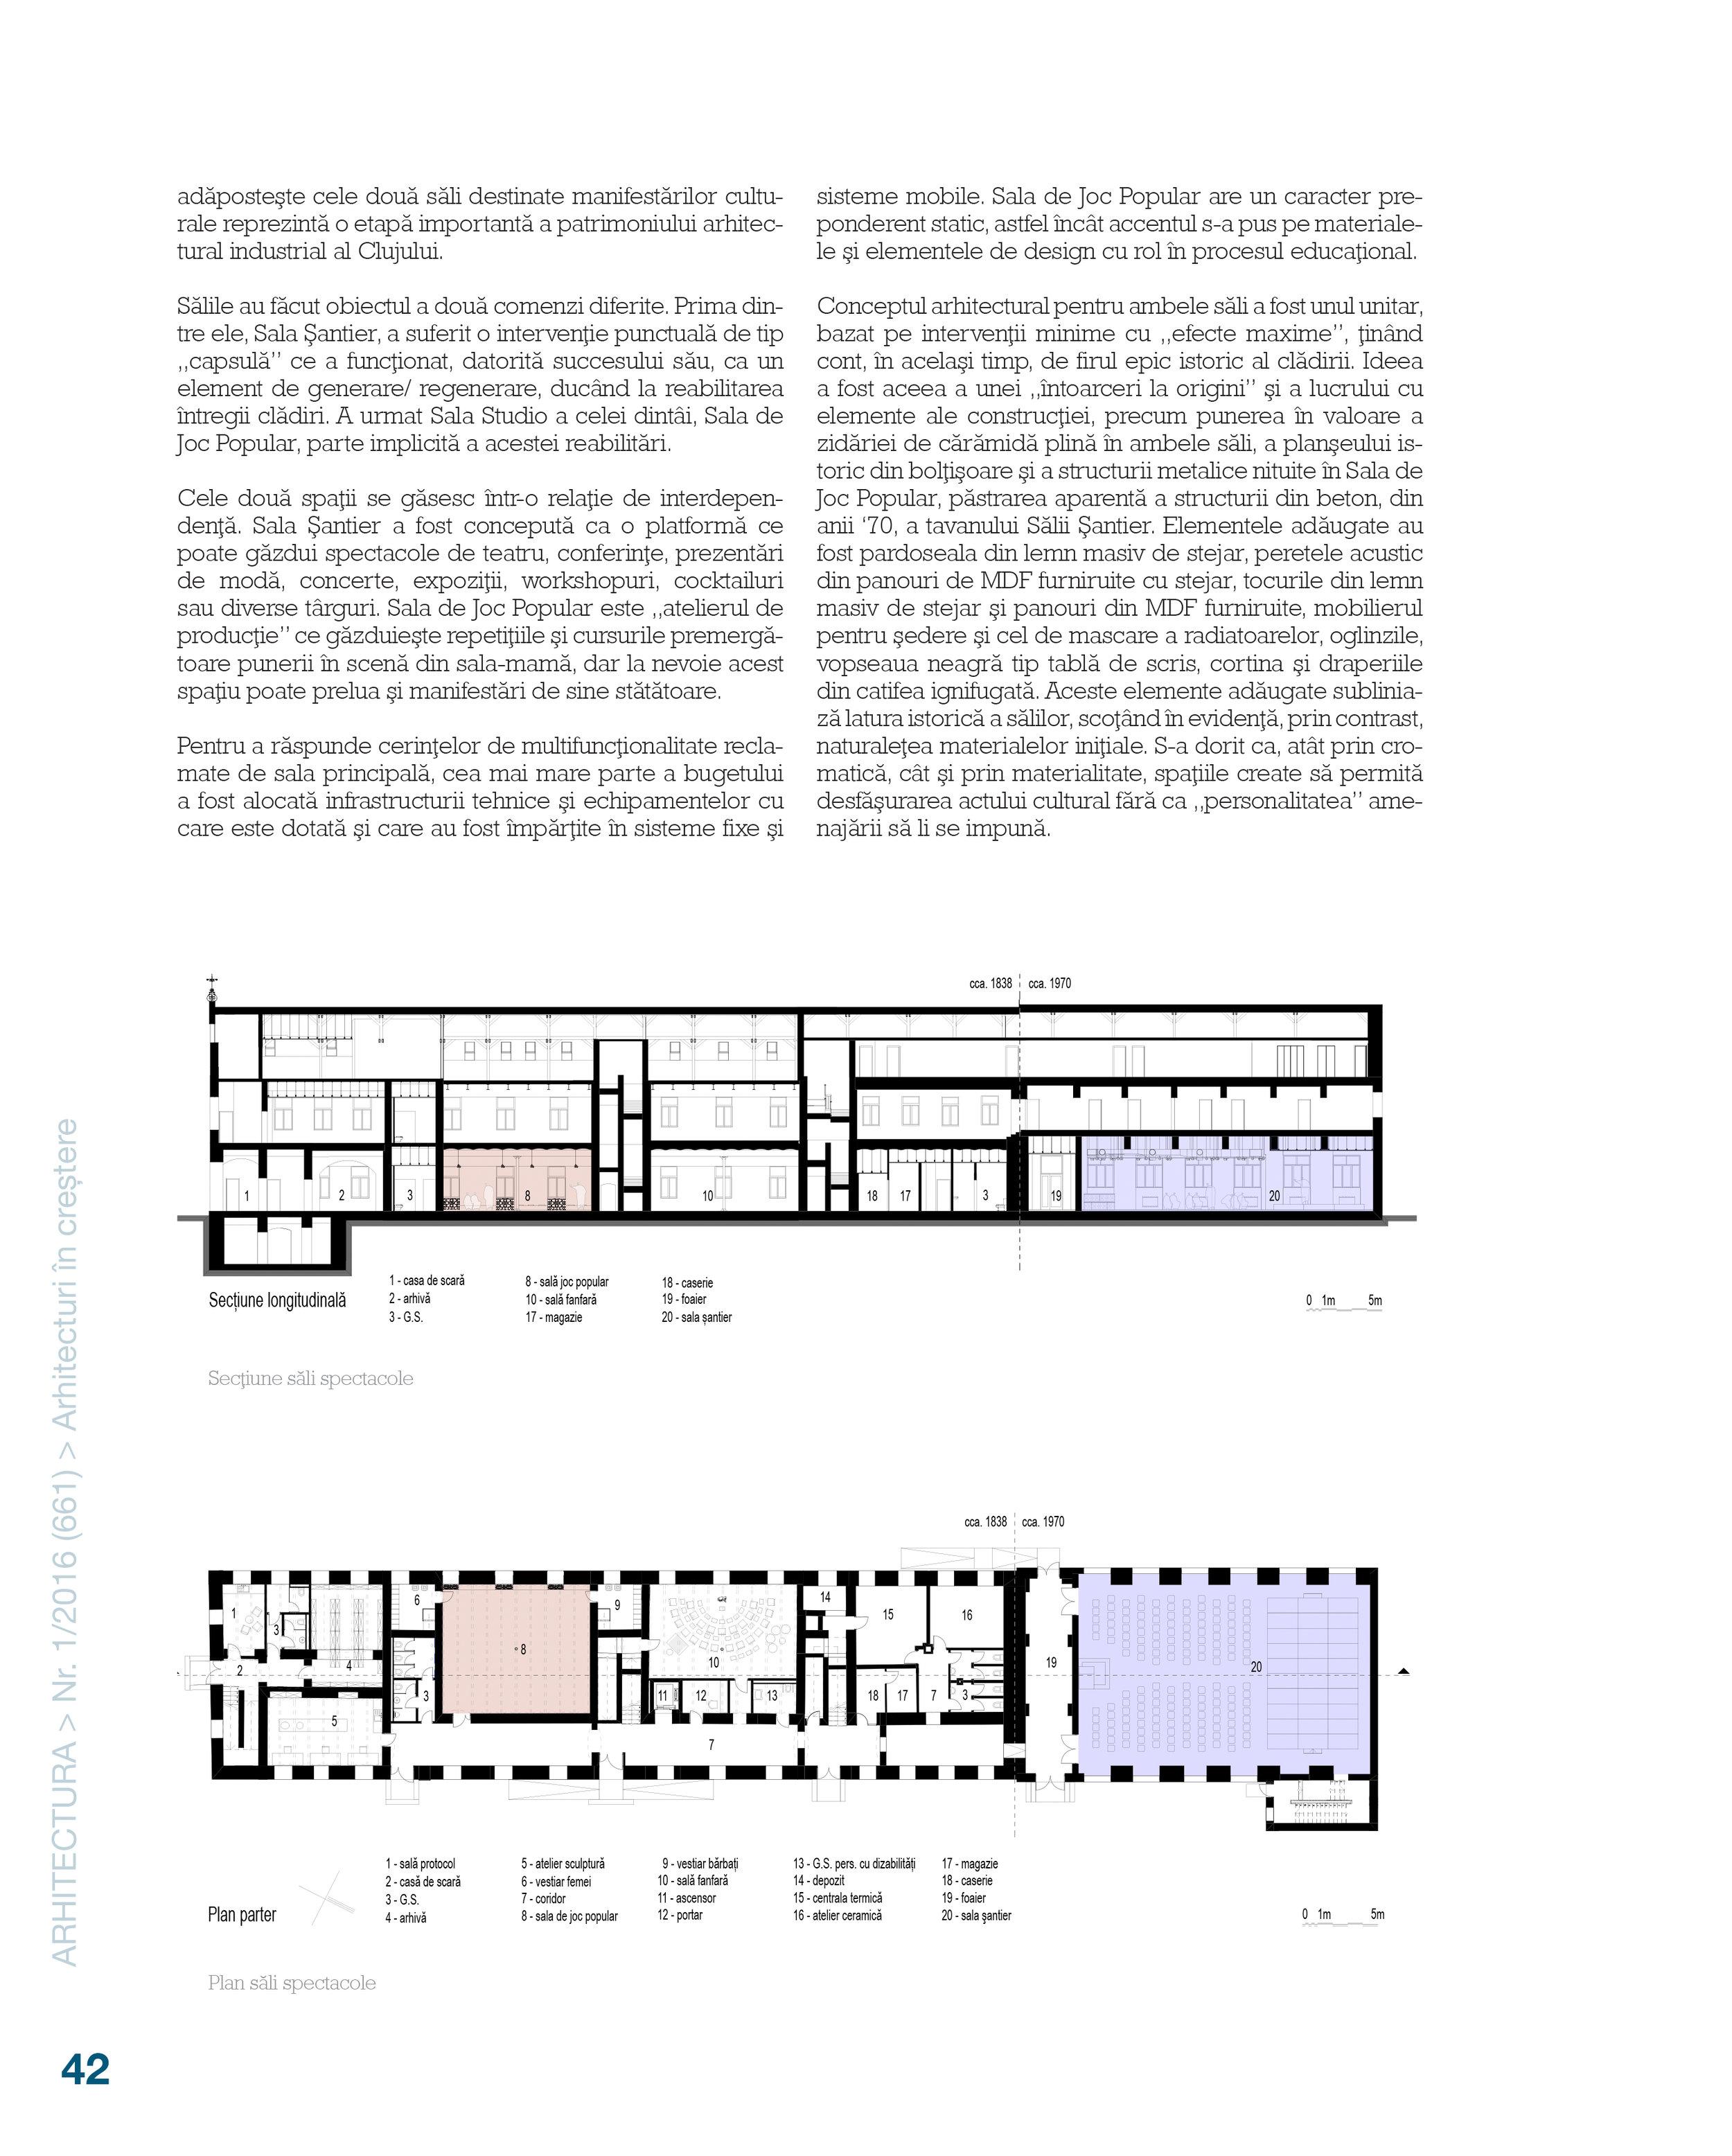 6_Arhitecturi in crestere 3.jpg